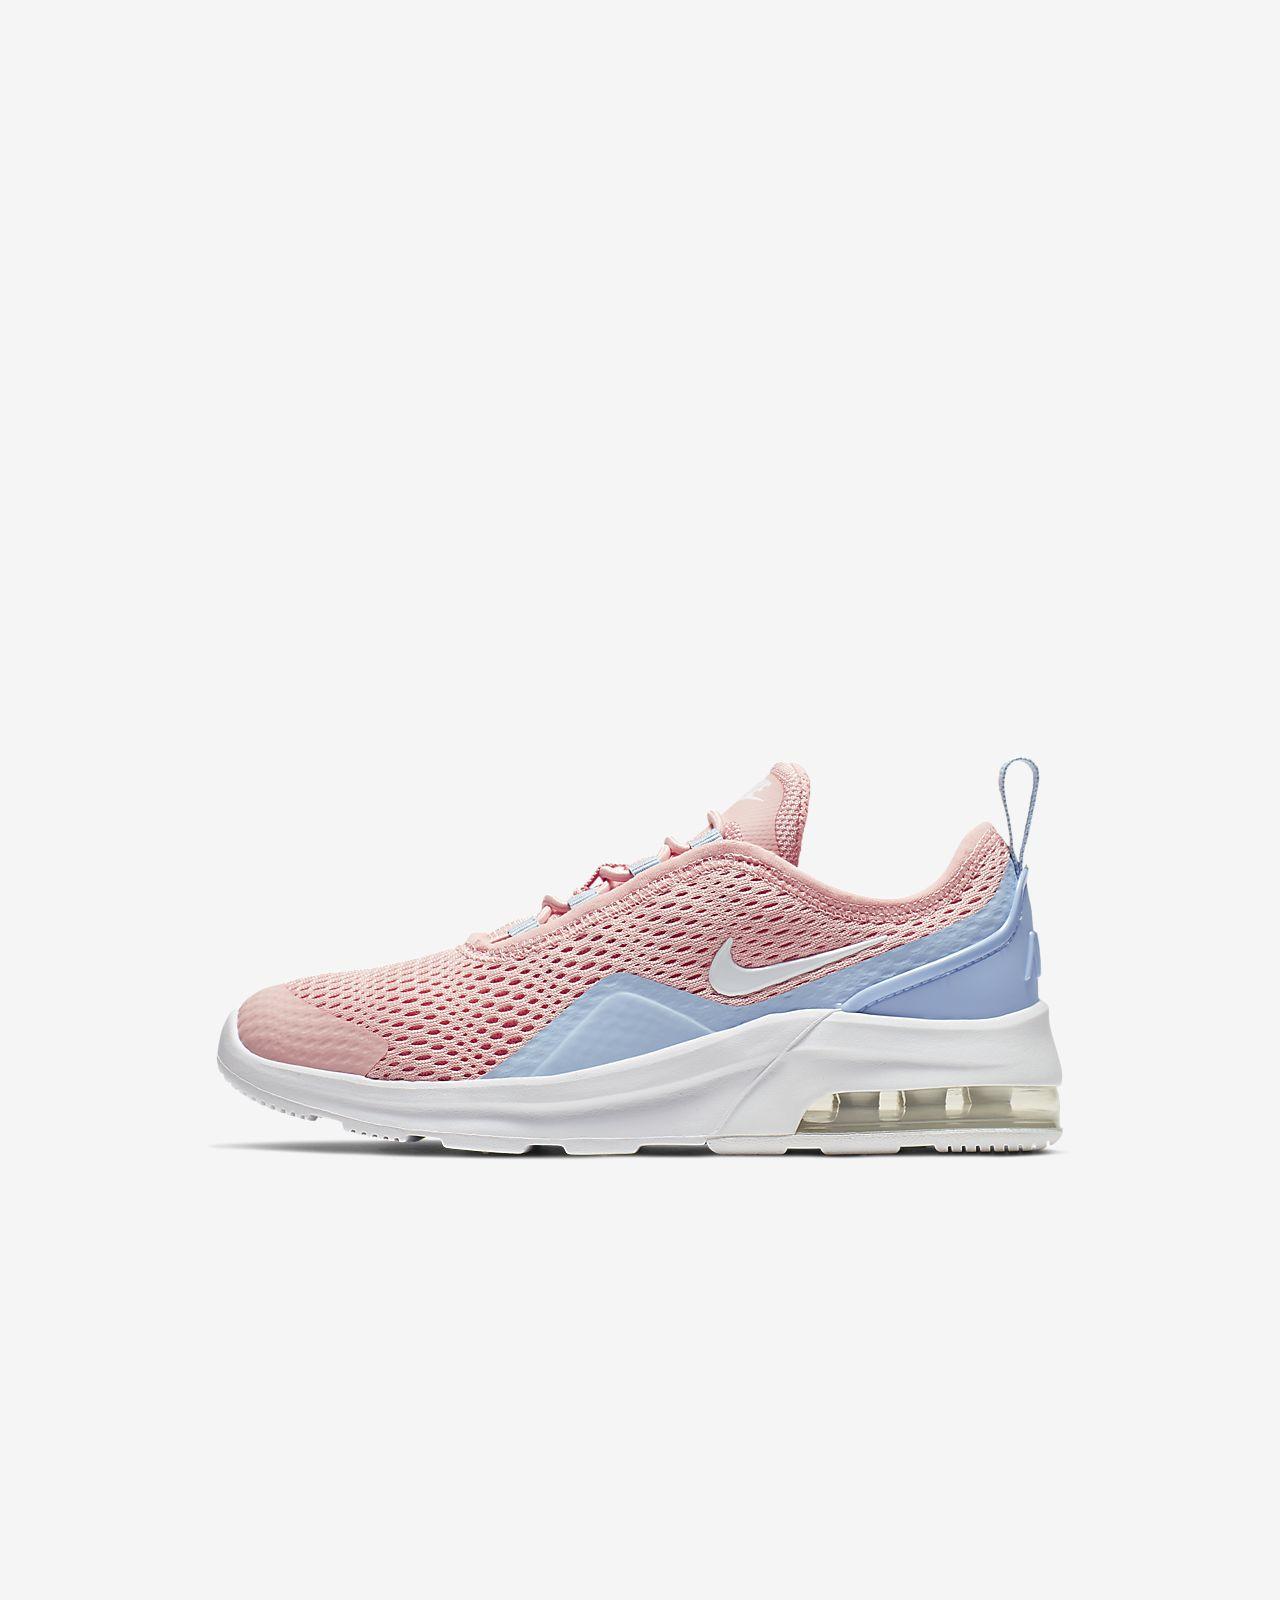 16f22010207a7b Nike Air Max Motion 2 Little Kids  Shoe. Nike.com